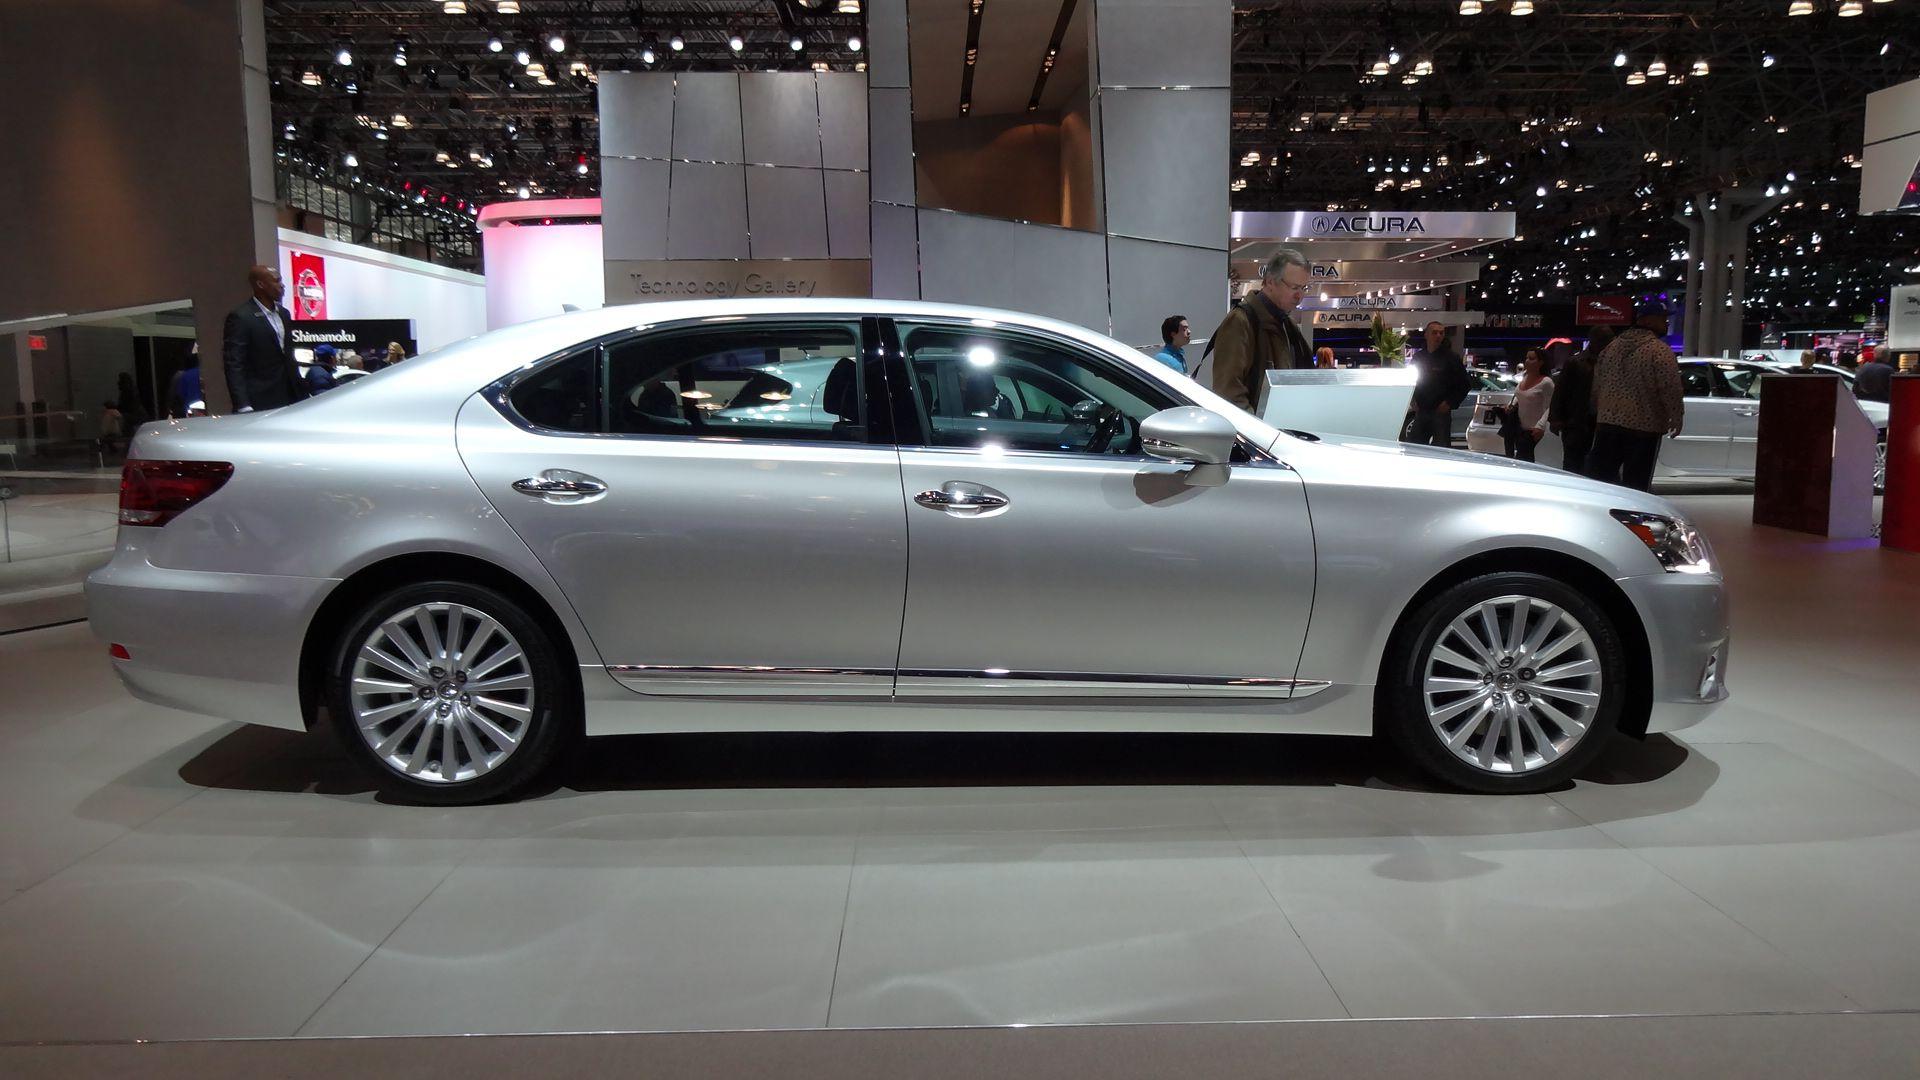 1a41240a6b9a1dbb6ea981b306426bdf Great Description About 2012 Lexus Es with Fascinating Images Cars Review